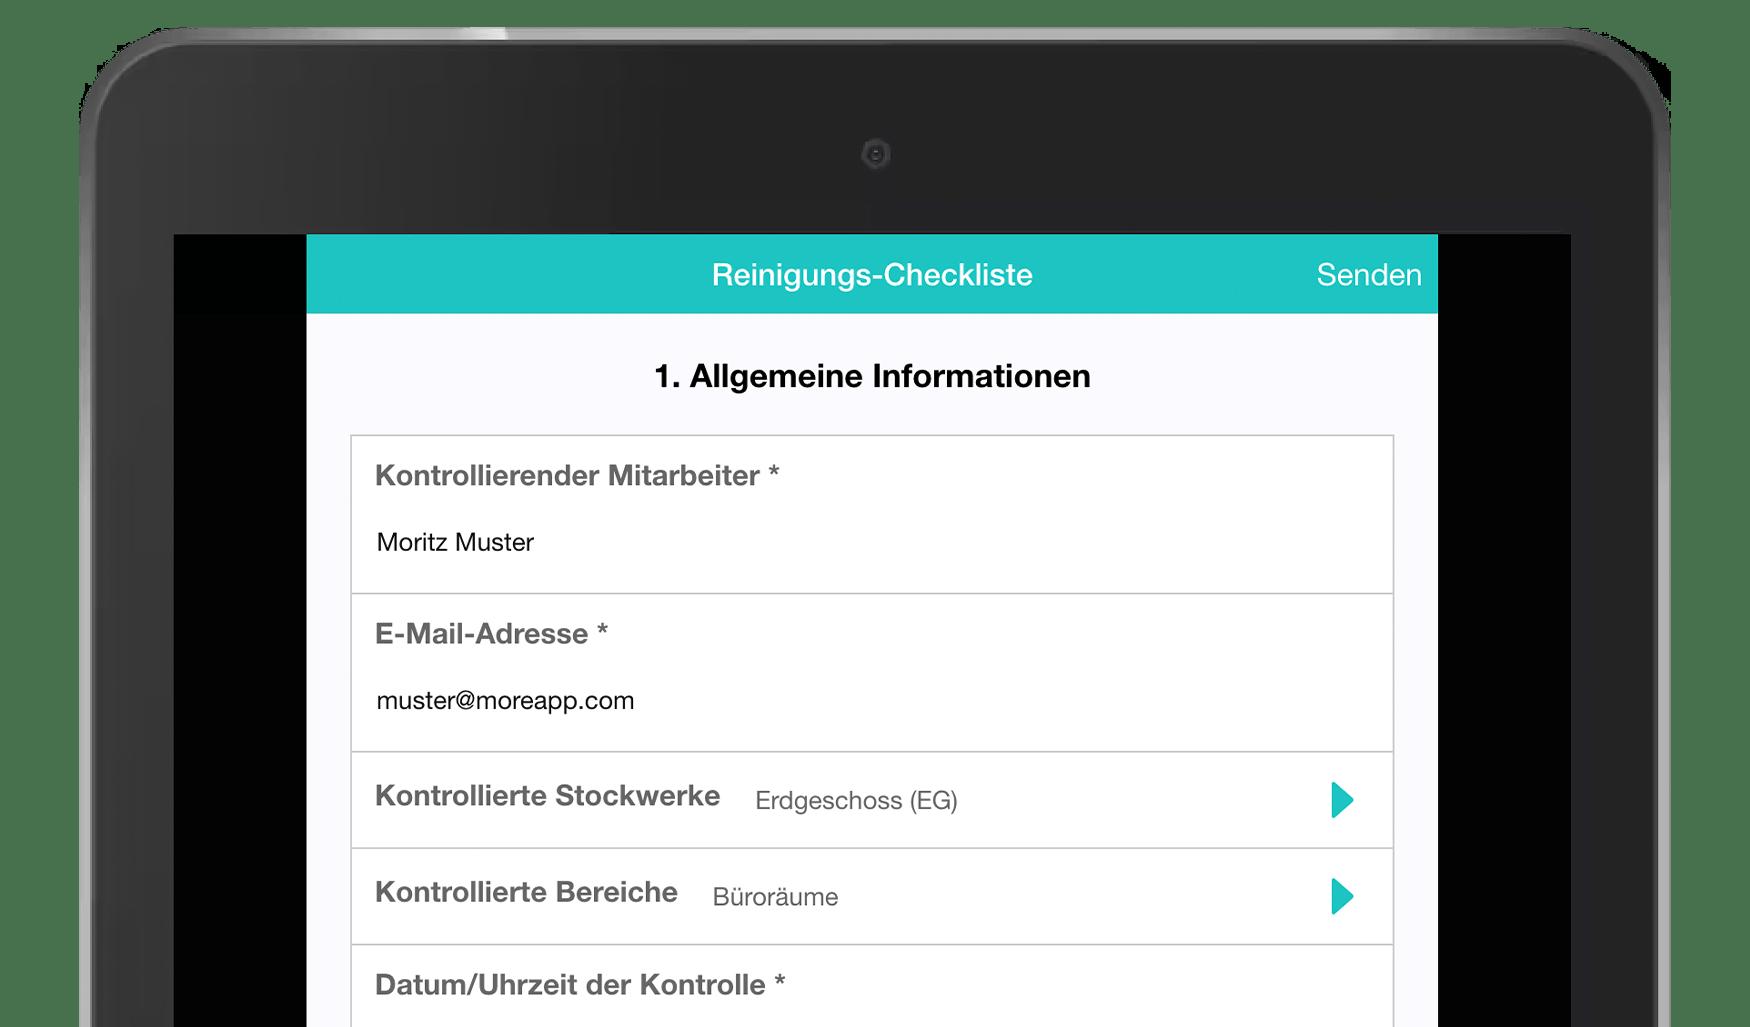 MoreApp Formulareditor Reinigungs-Checkliste